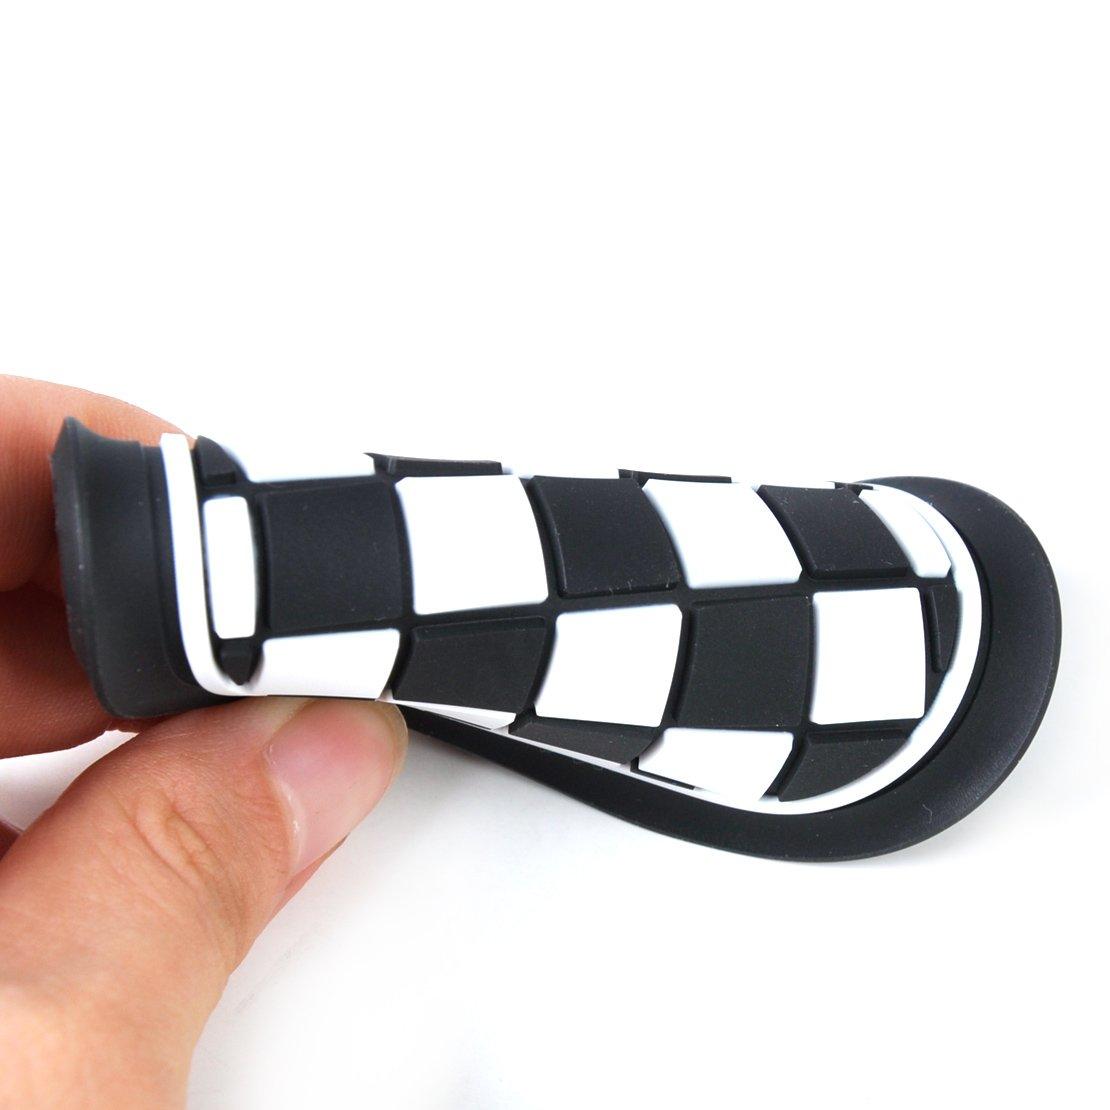 beler 3pcs Car Cupholder Mats Anti-Slip Cup Pads Chess Patten